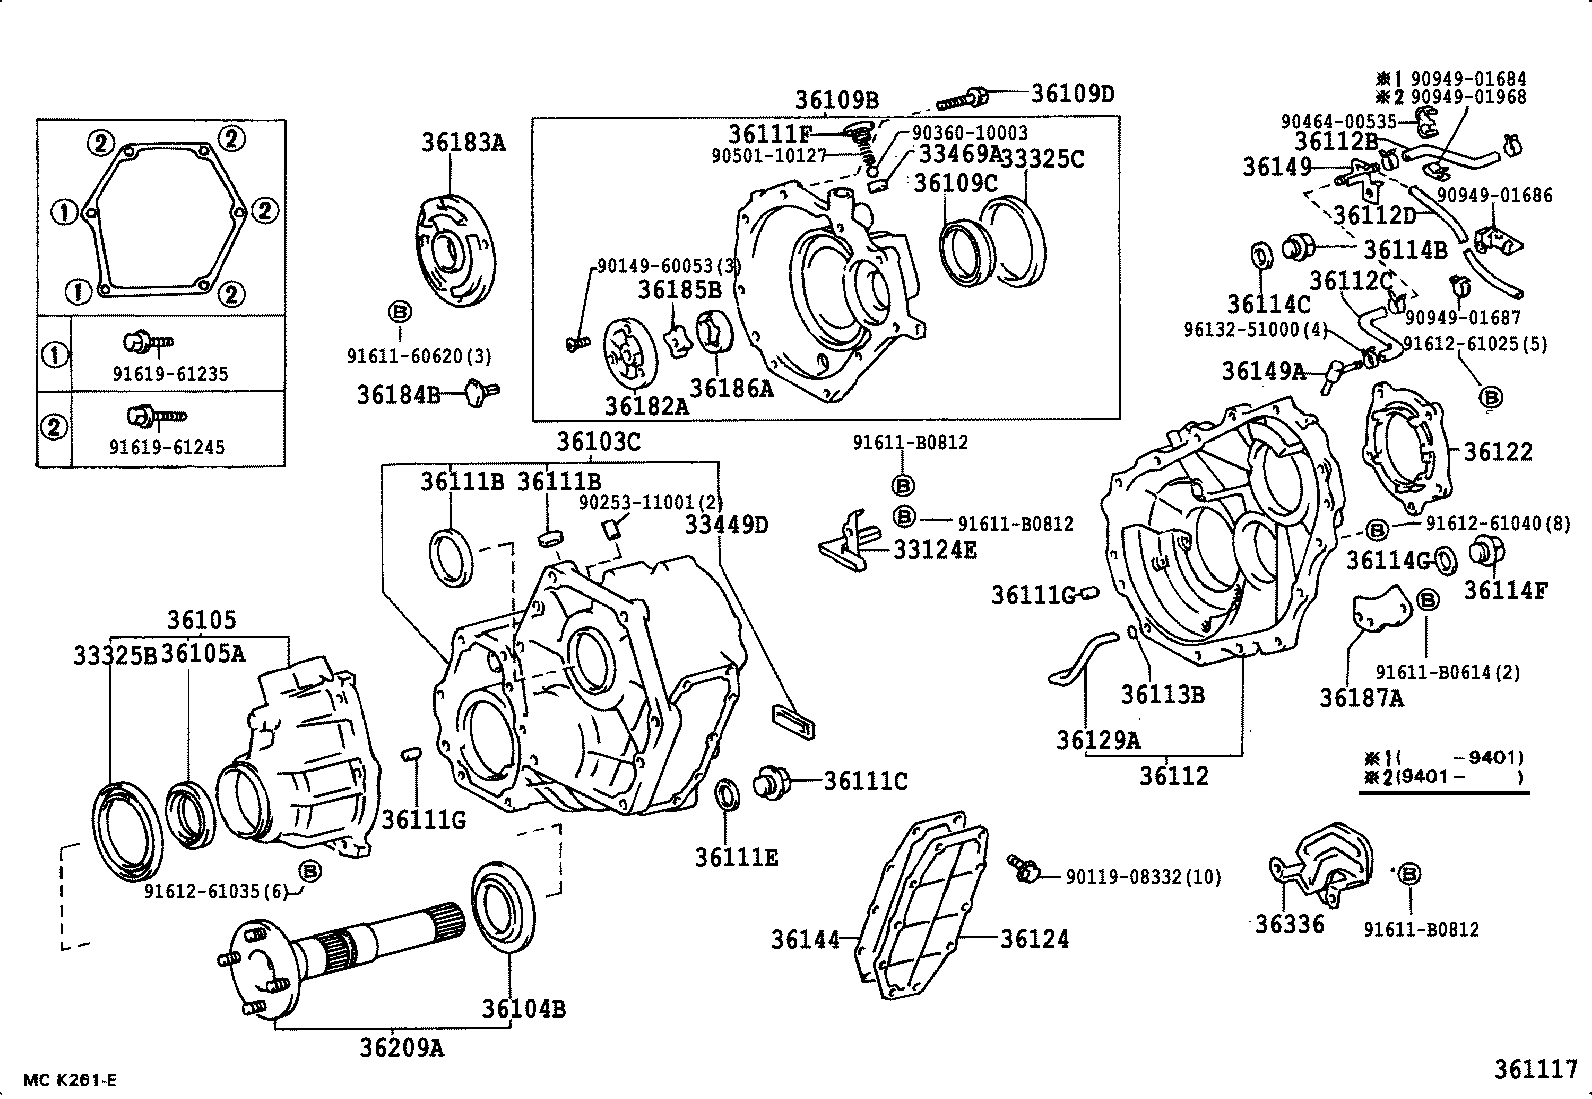 1992 toyota tercel engine diagram    toyota    land cruiser 80fzj80l gcmrkw powertrain chassis     toyota    land cruiser 80fzj80l gcmrkw powertrain chassis